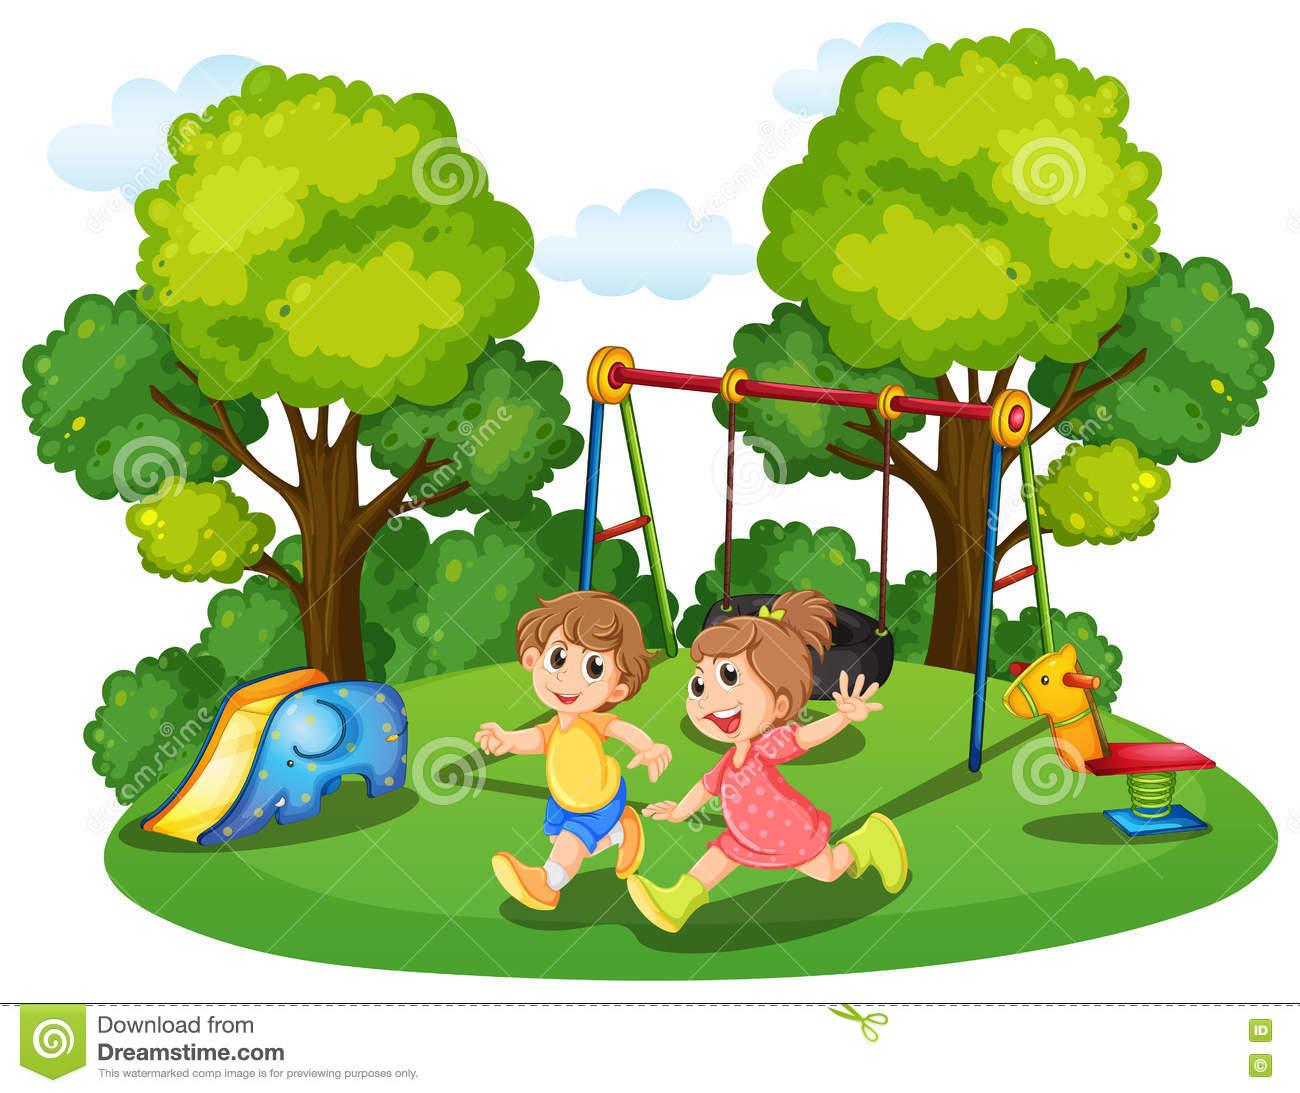 Two Kids Running Park Stock Illustrations u2013 16 Two Kids Running Park Stock  Illustrations, Vectors u0026 Clipart - Dreamstime